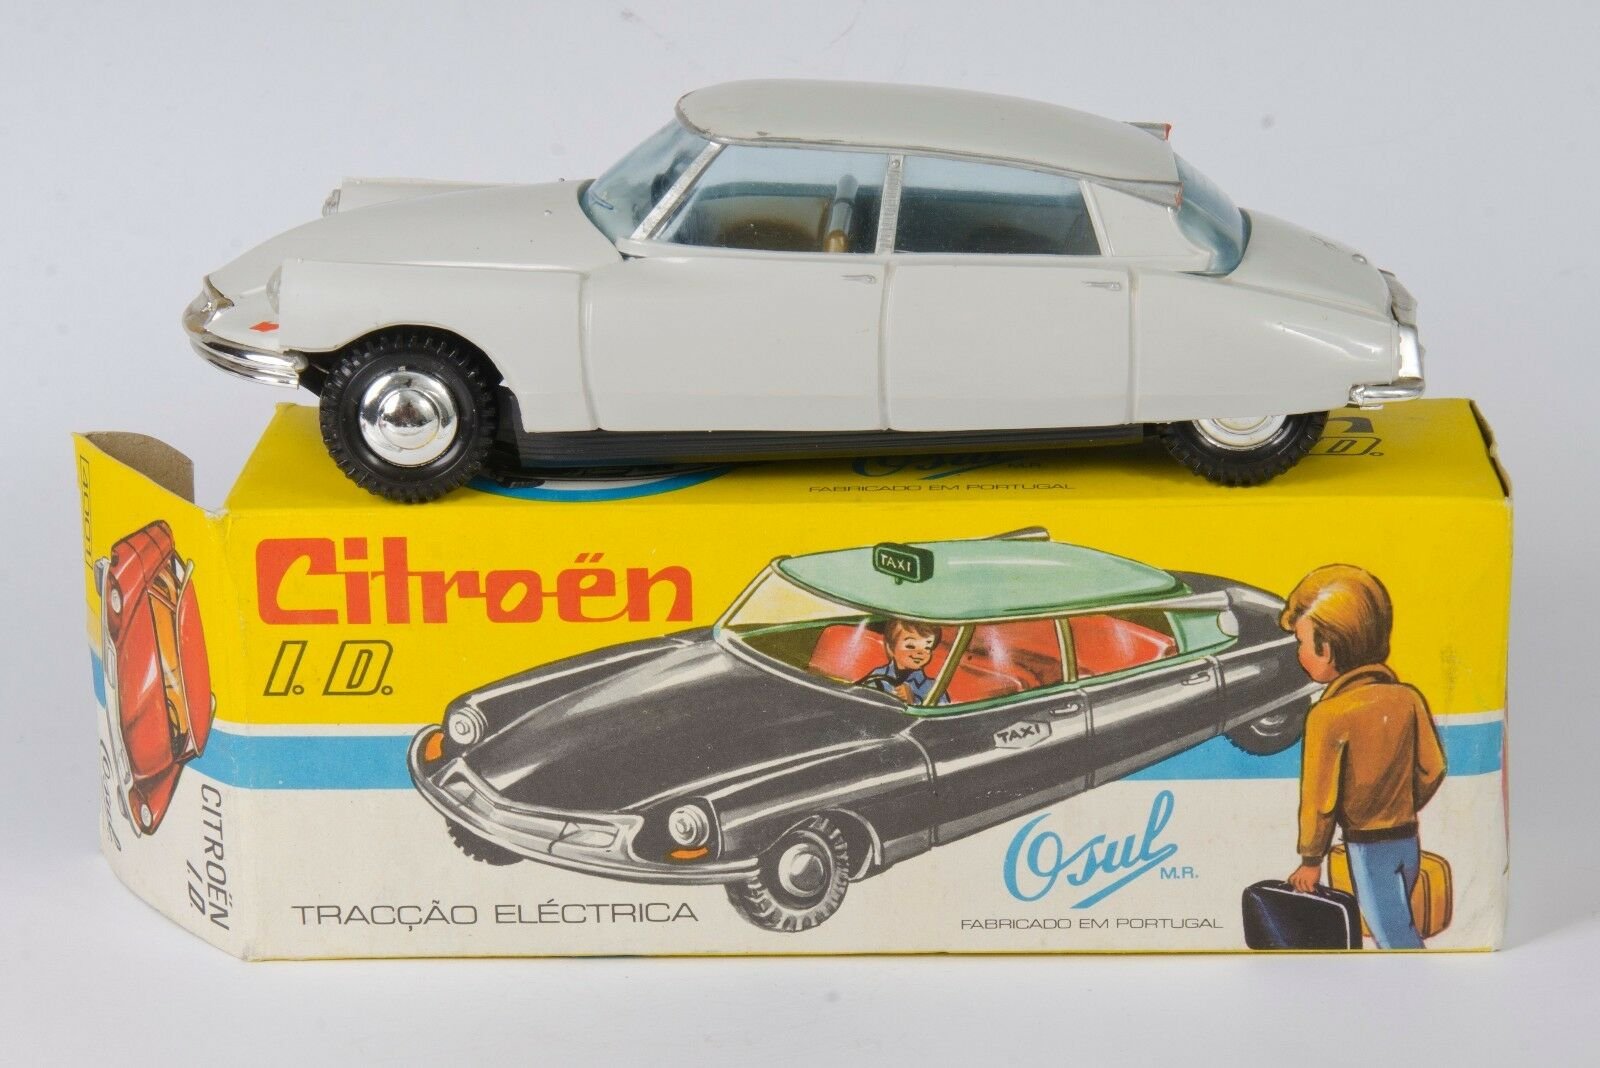 Osul 4001 Citroën I.D. Gloss Grey. 1 24. Near-MINT Boxed. Rare. Vintage